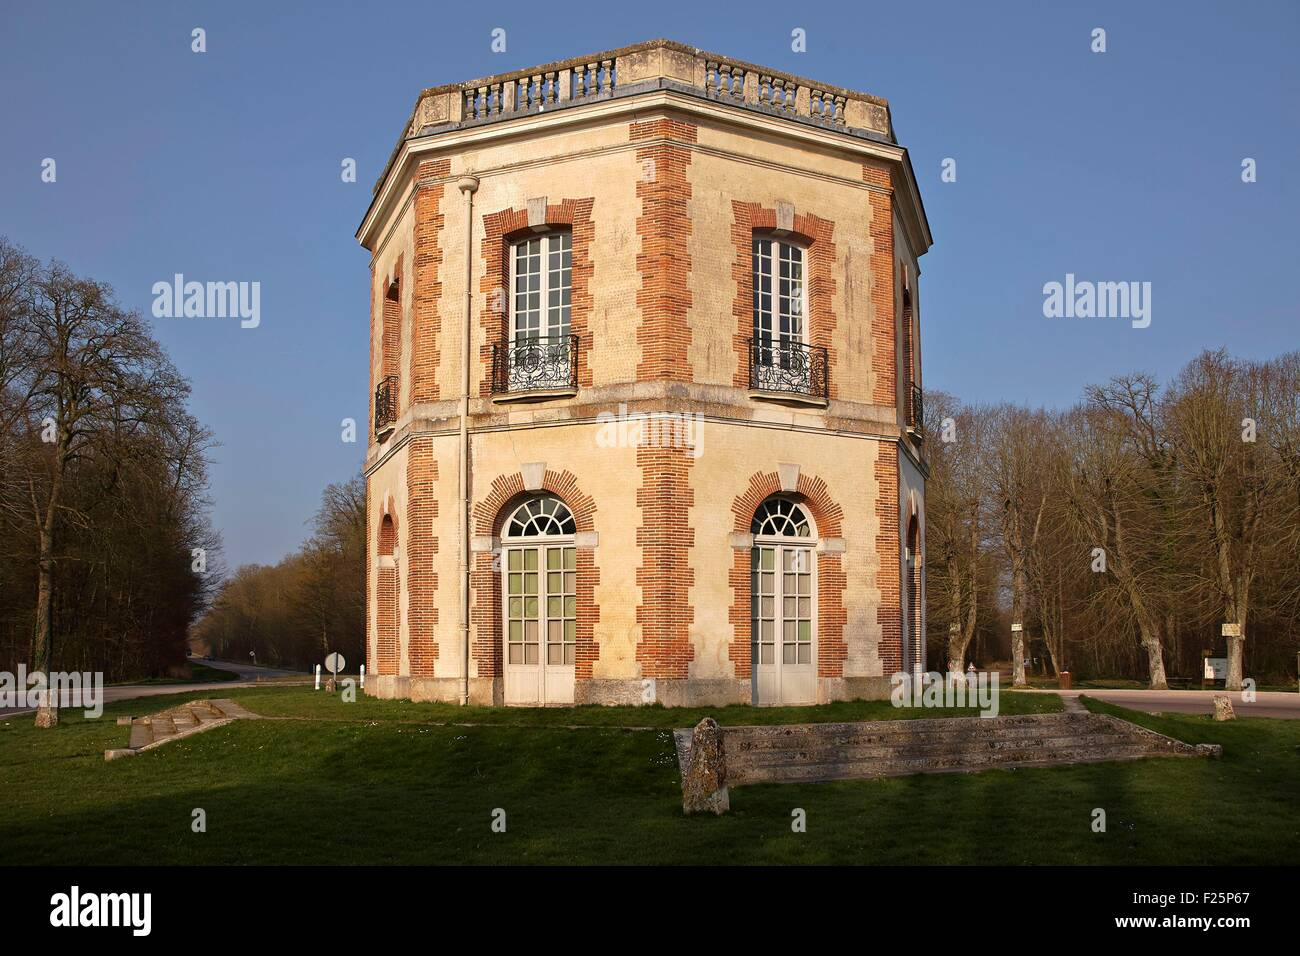 France, Eure et Loir, Abondant, Octagonal Hunting pavilion in the Dreux forest - Stock Image